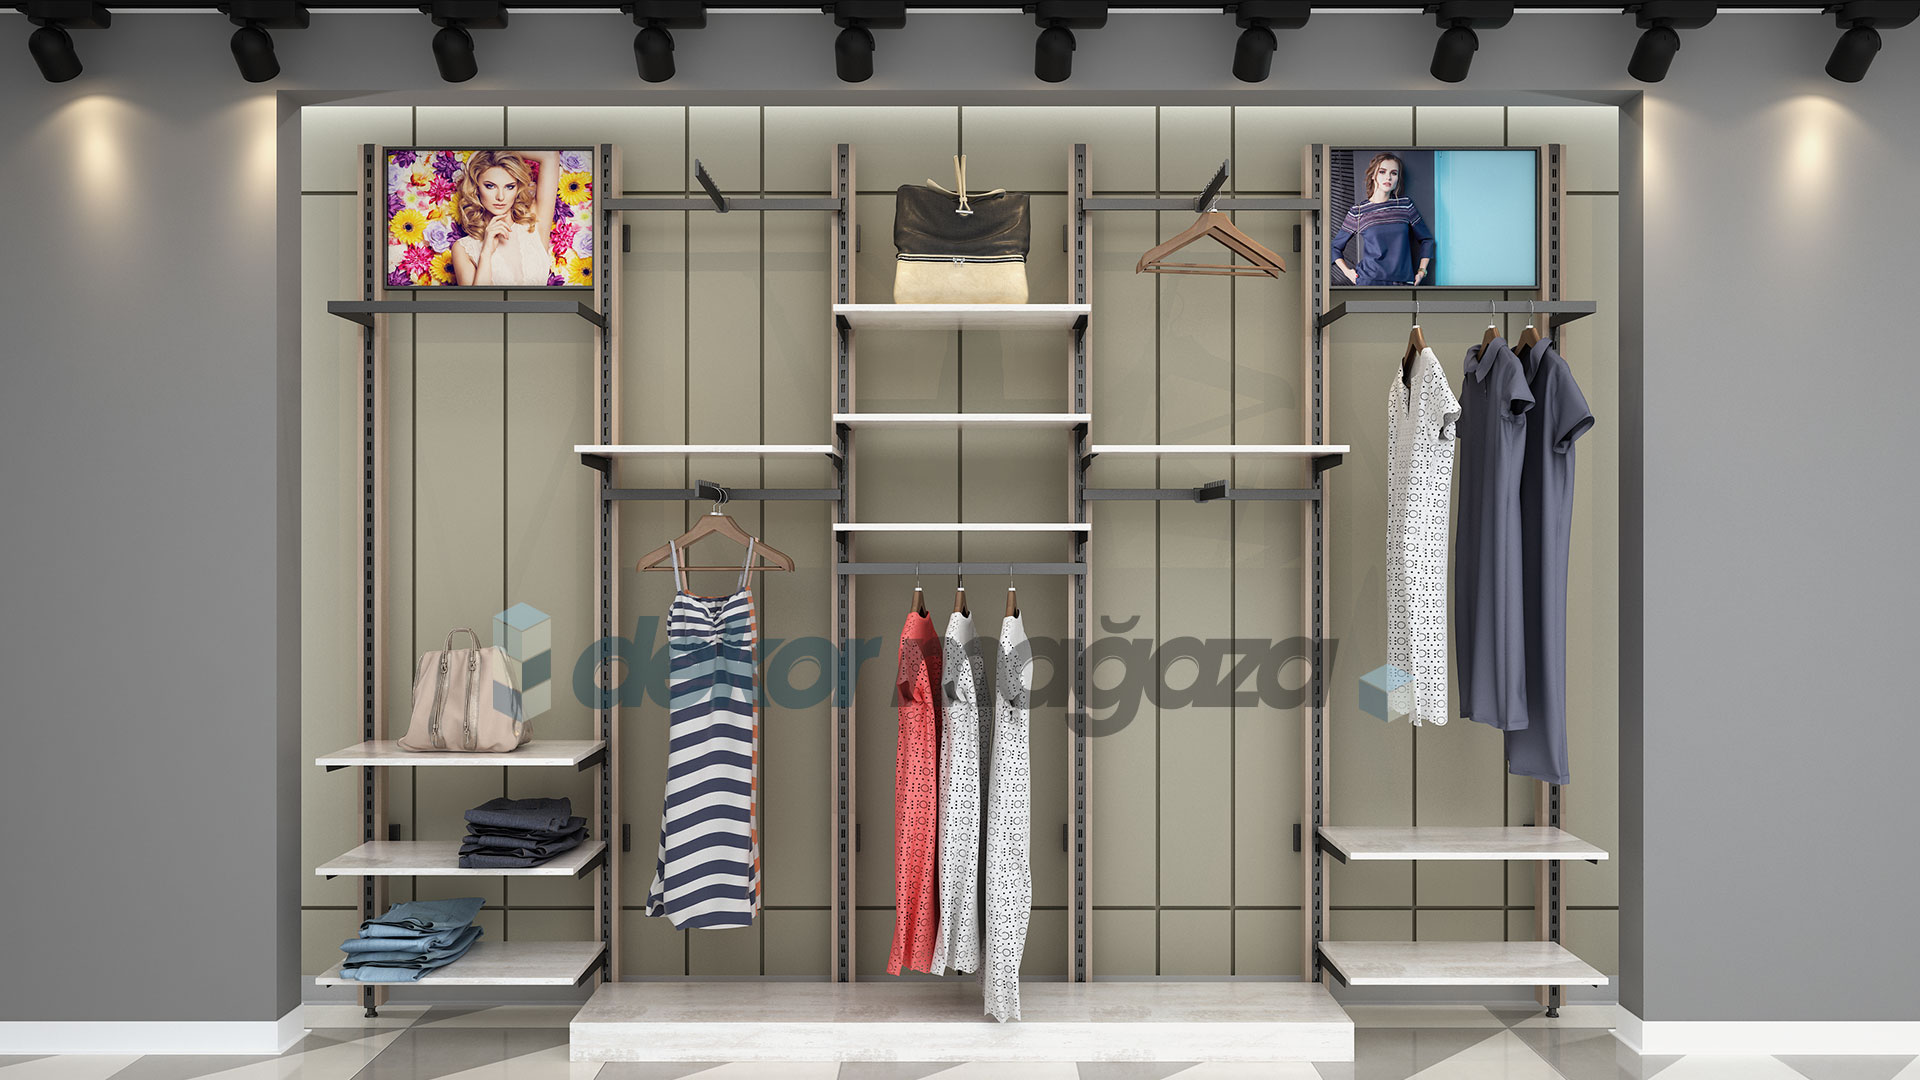 dekor-magaza-dekorasyon-magaza-raf-sistemleri-panos-032021-4-1